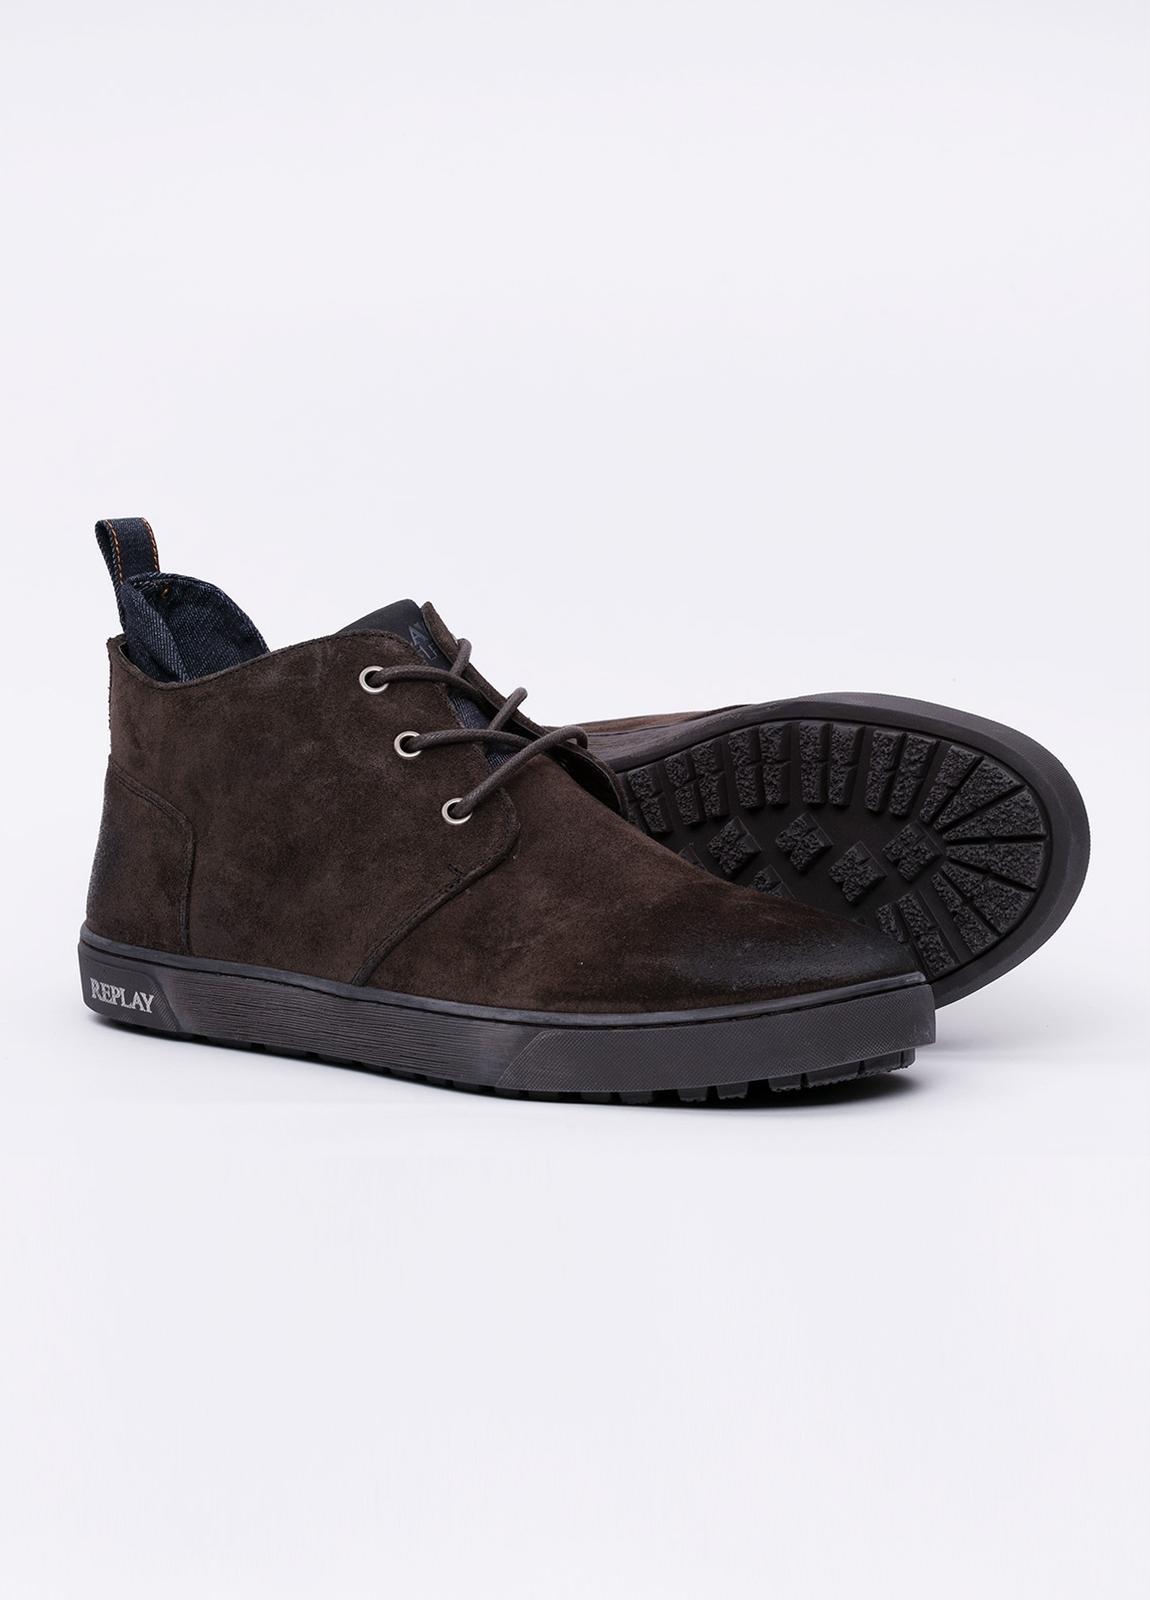 Botín de cordones modelo MALBY color marrón oscuro. 100% Serraje. - Ítem3